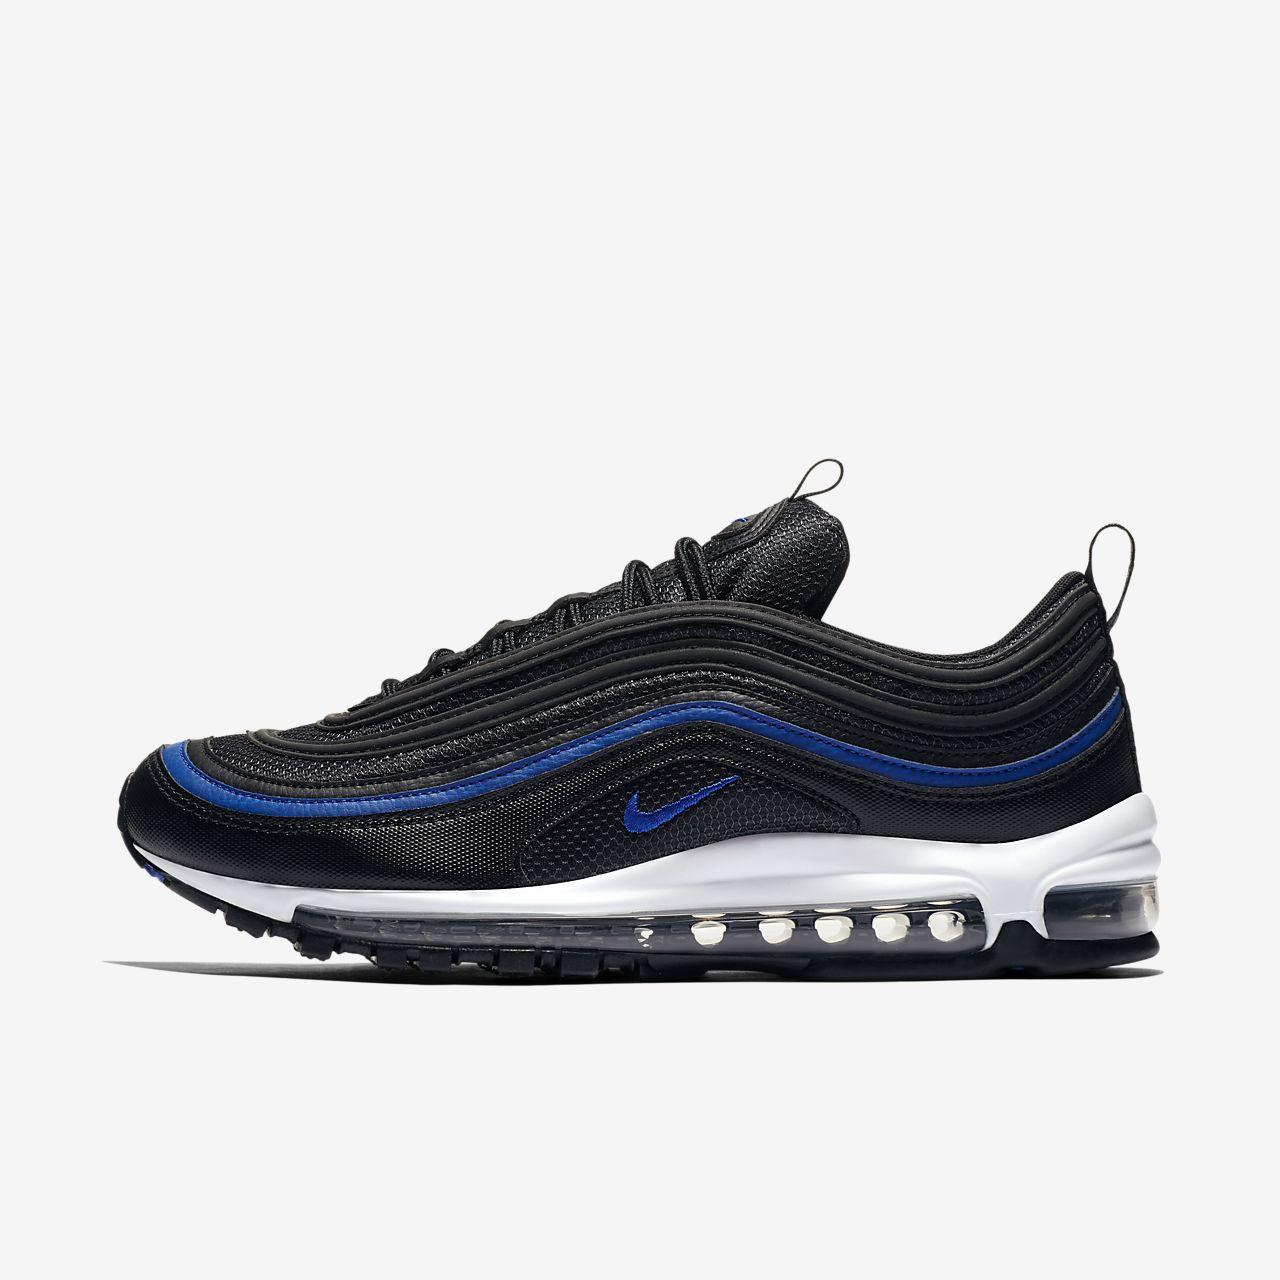 Nike Air Max 97 OG Men's Shoe